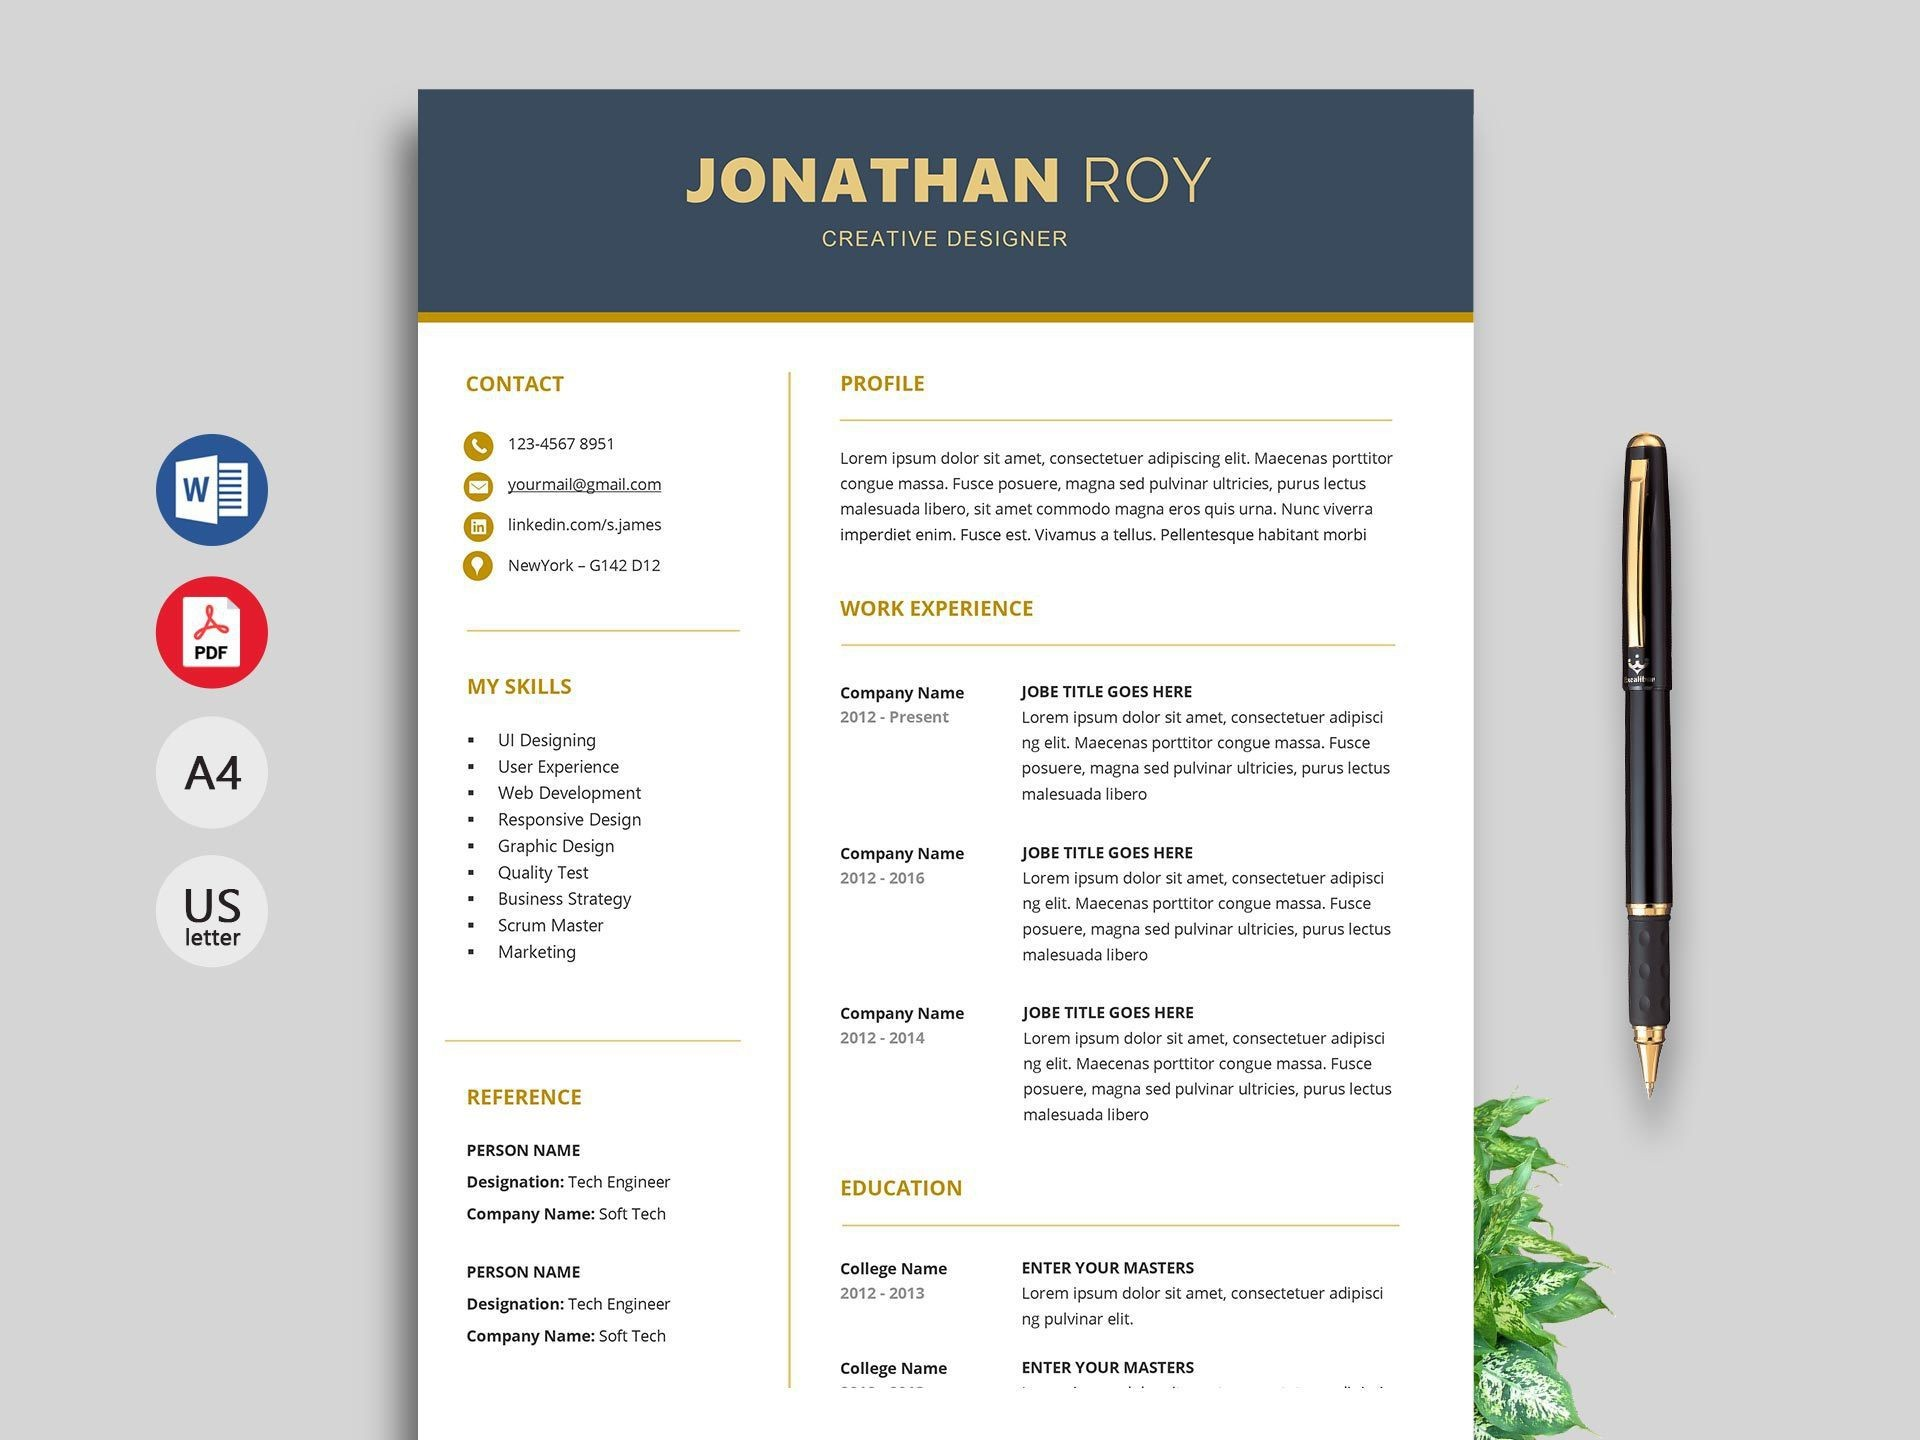 004 Impressive Download Resume Sample Free Example  Teacher Cv Graphic Designer Word Format Nurse Template1920